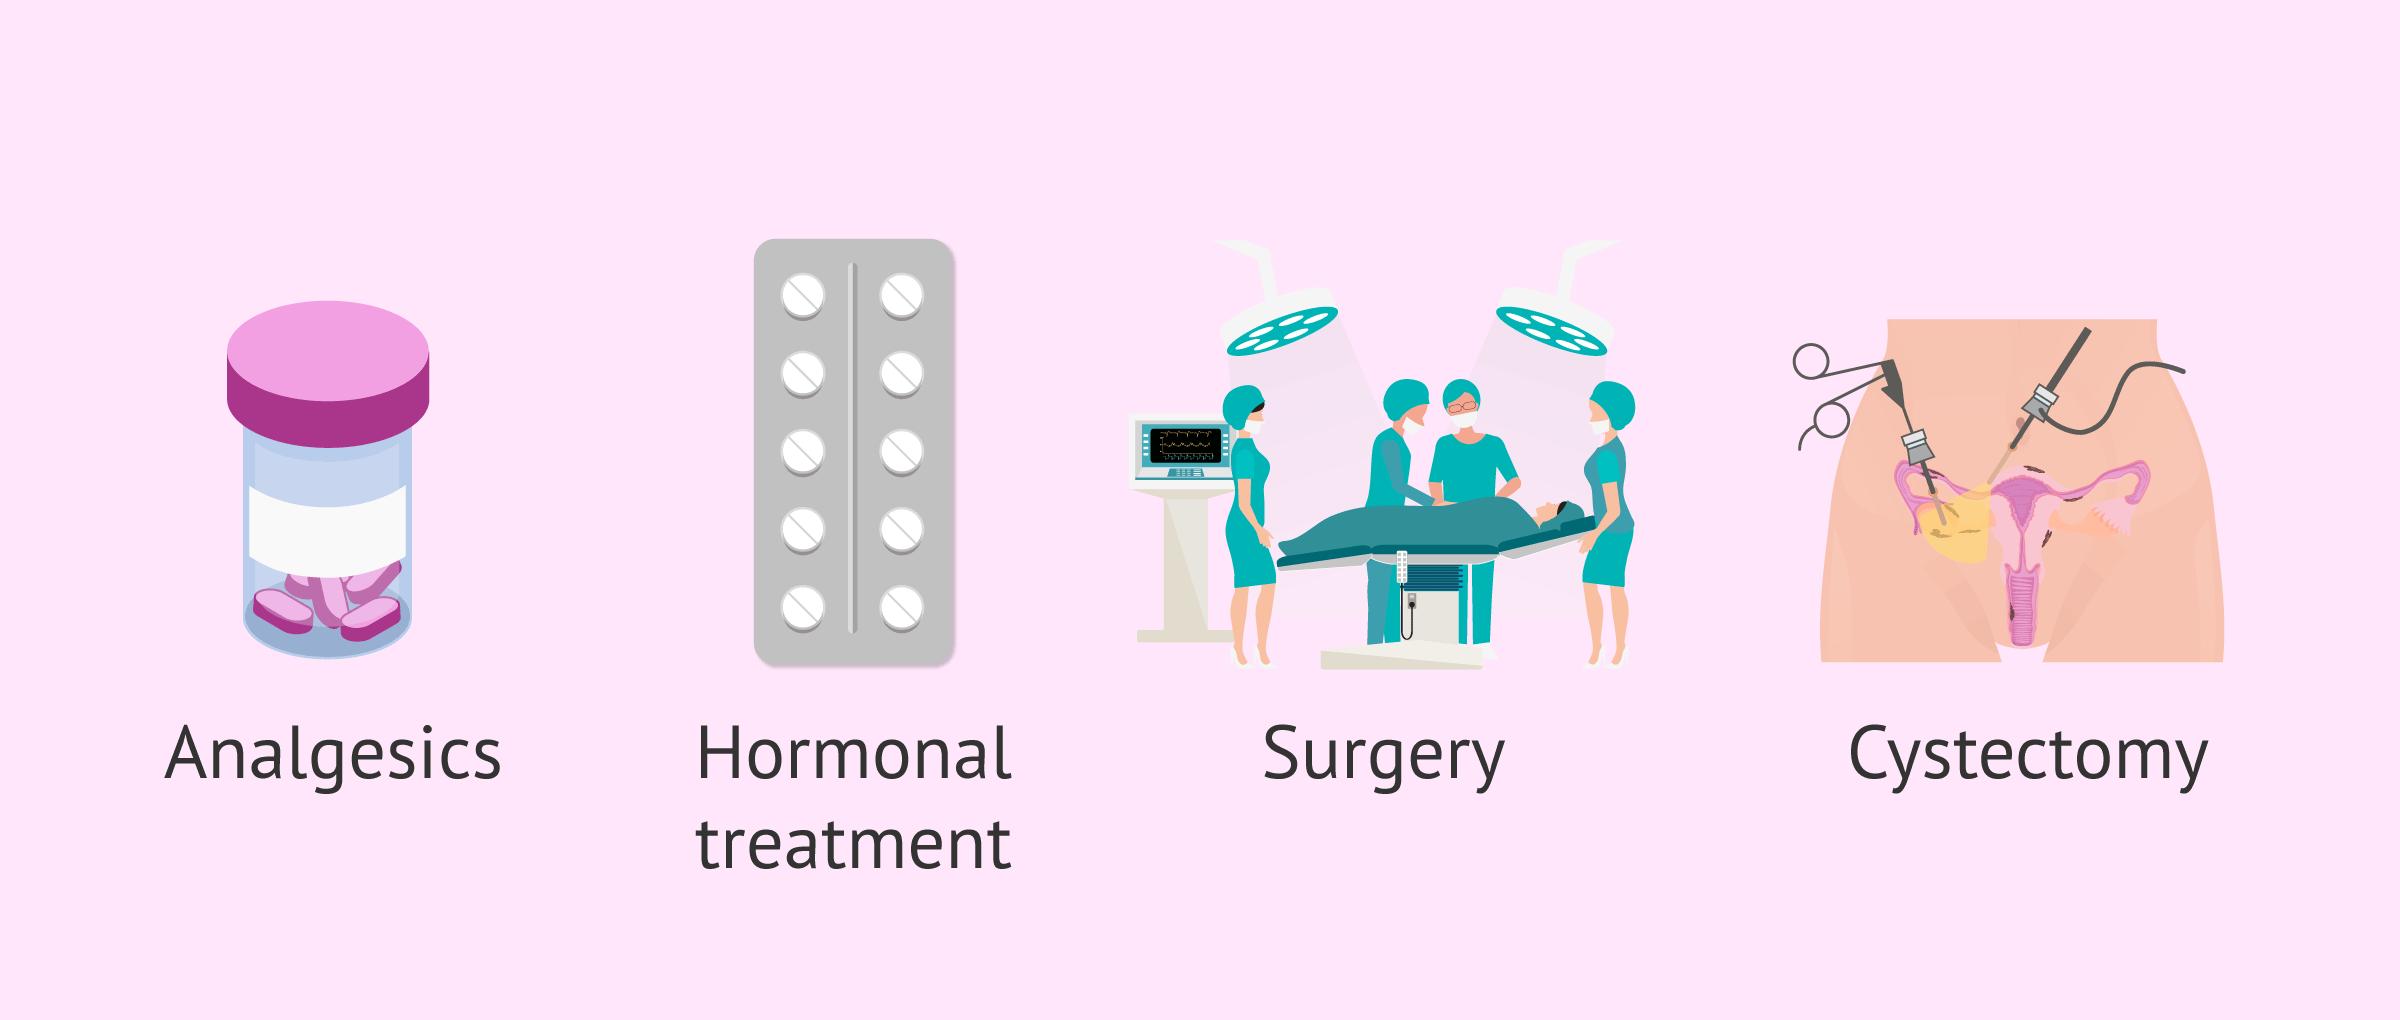 Endometriosis treatment and natural pregnancy